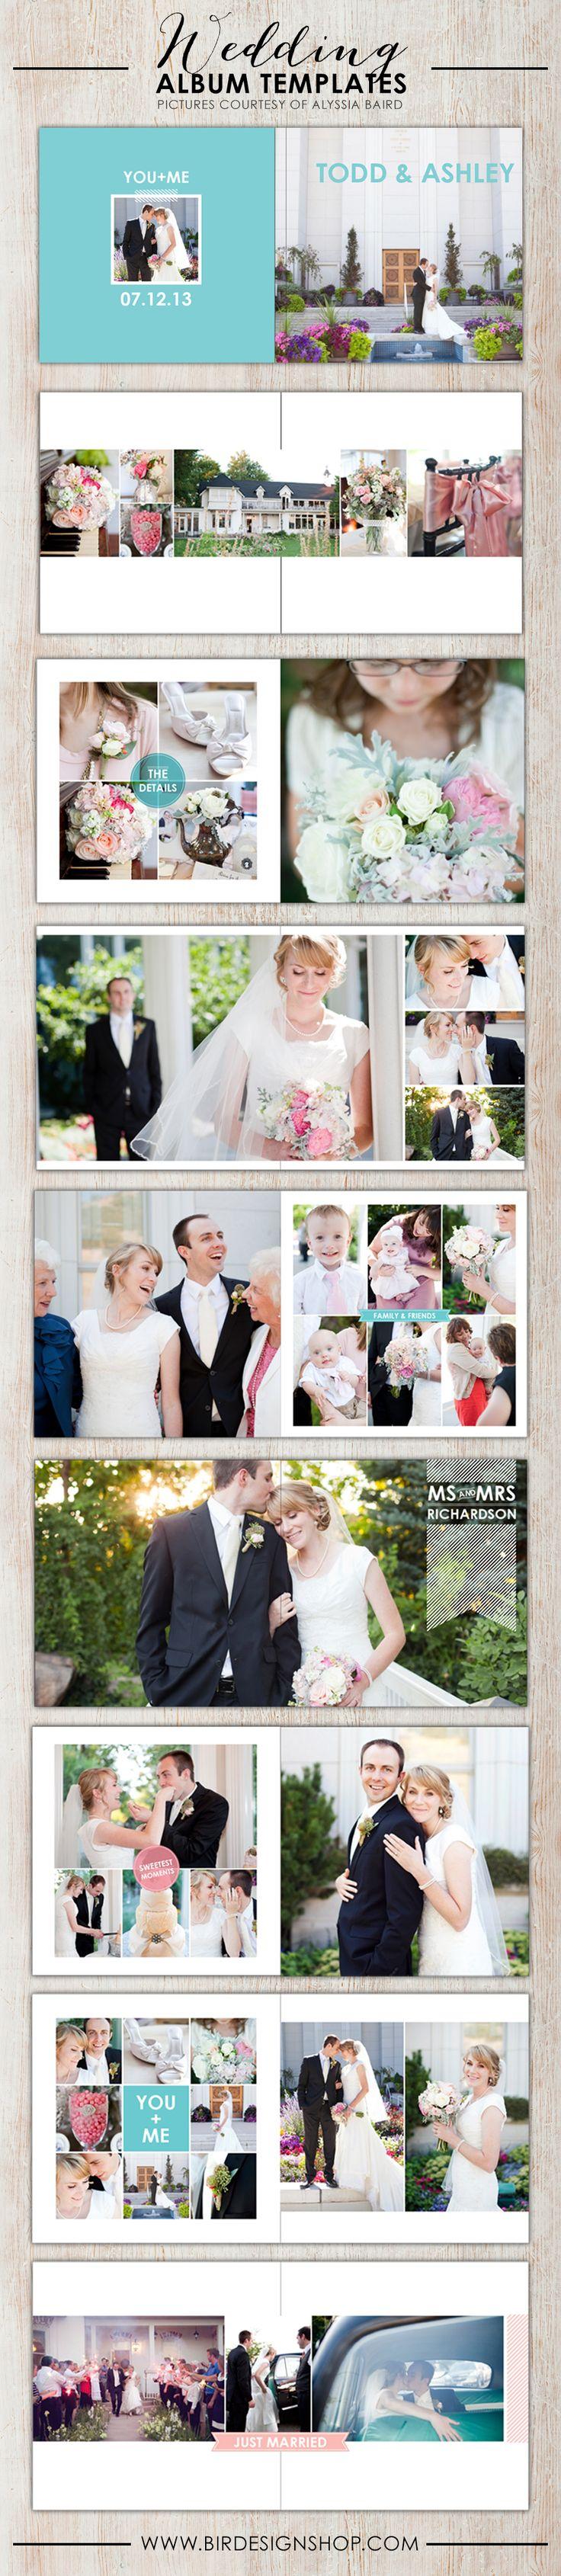 wedding photoshop album templates